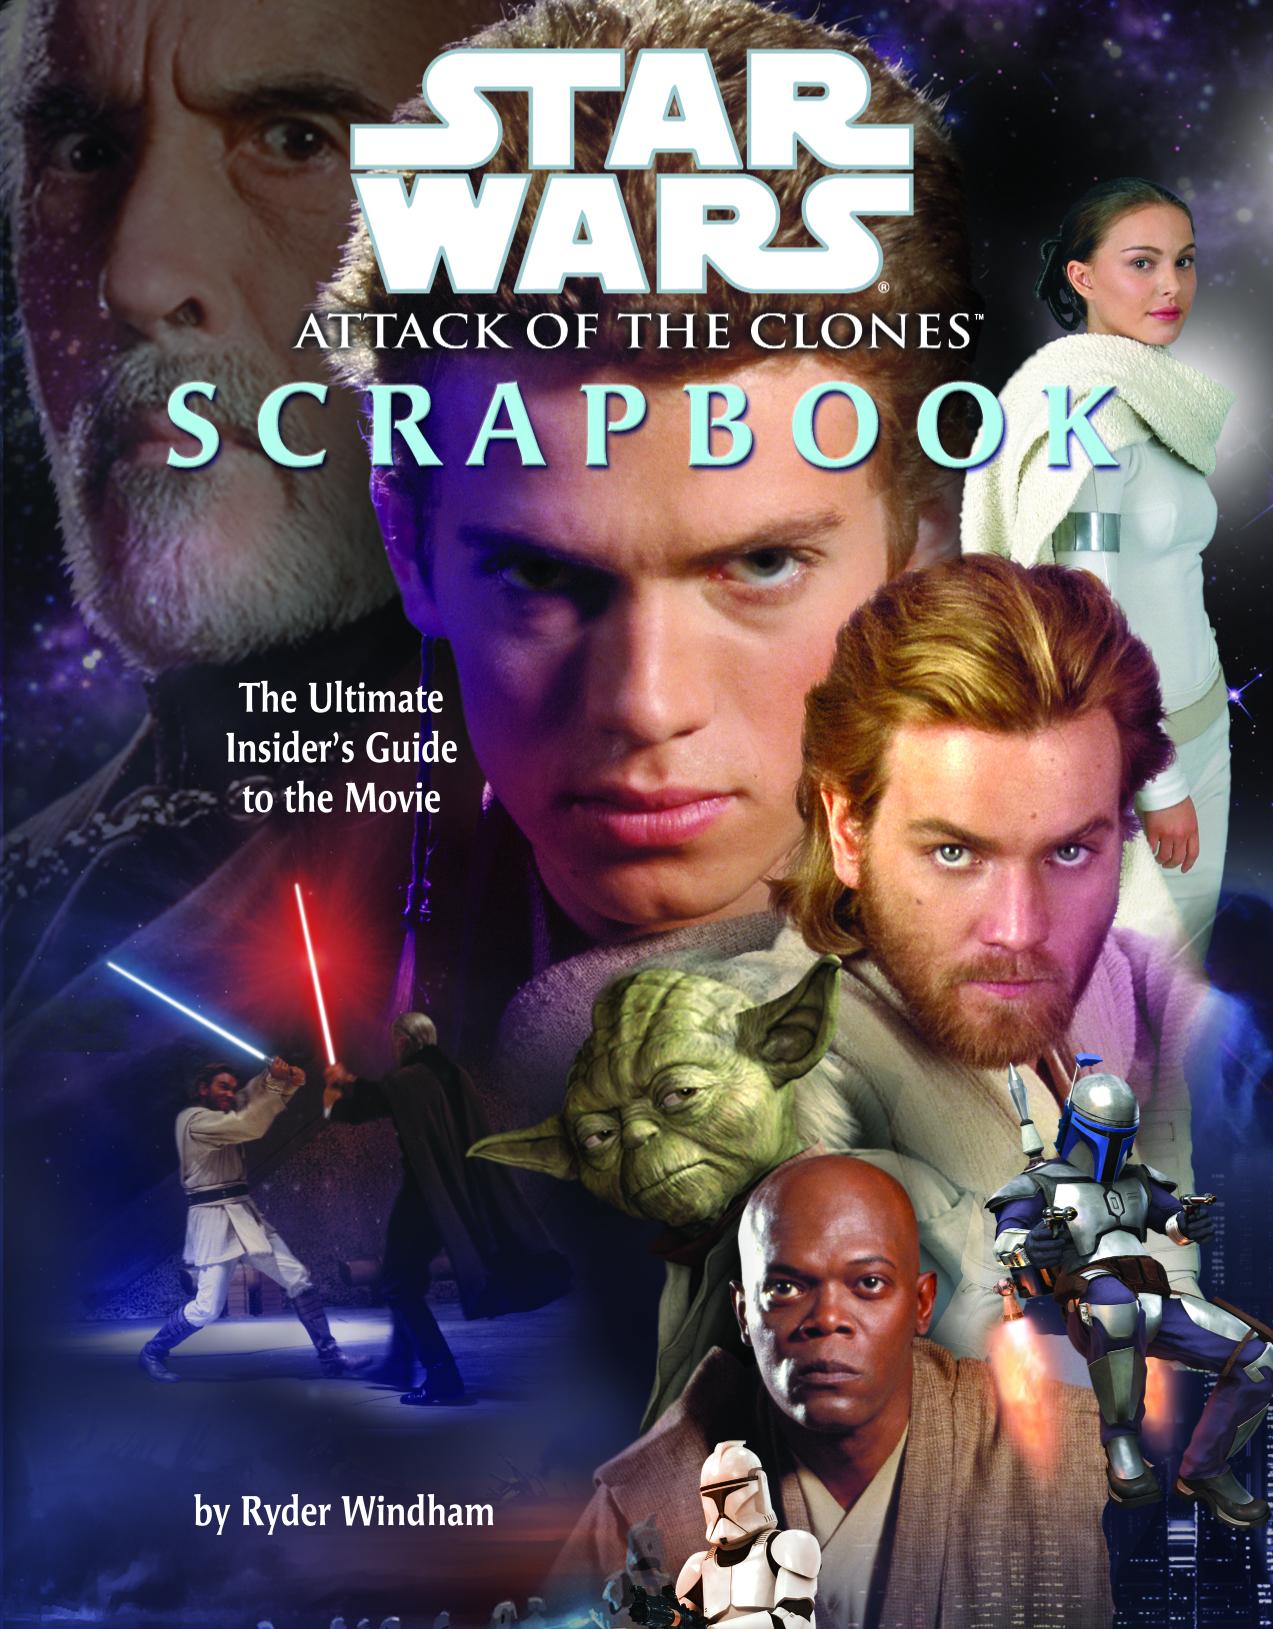 Attack of the Clones Scrapbook.jpg